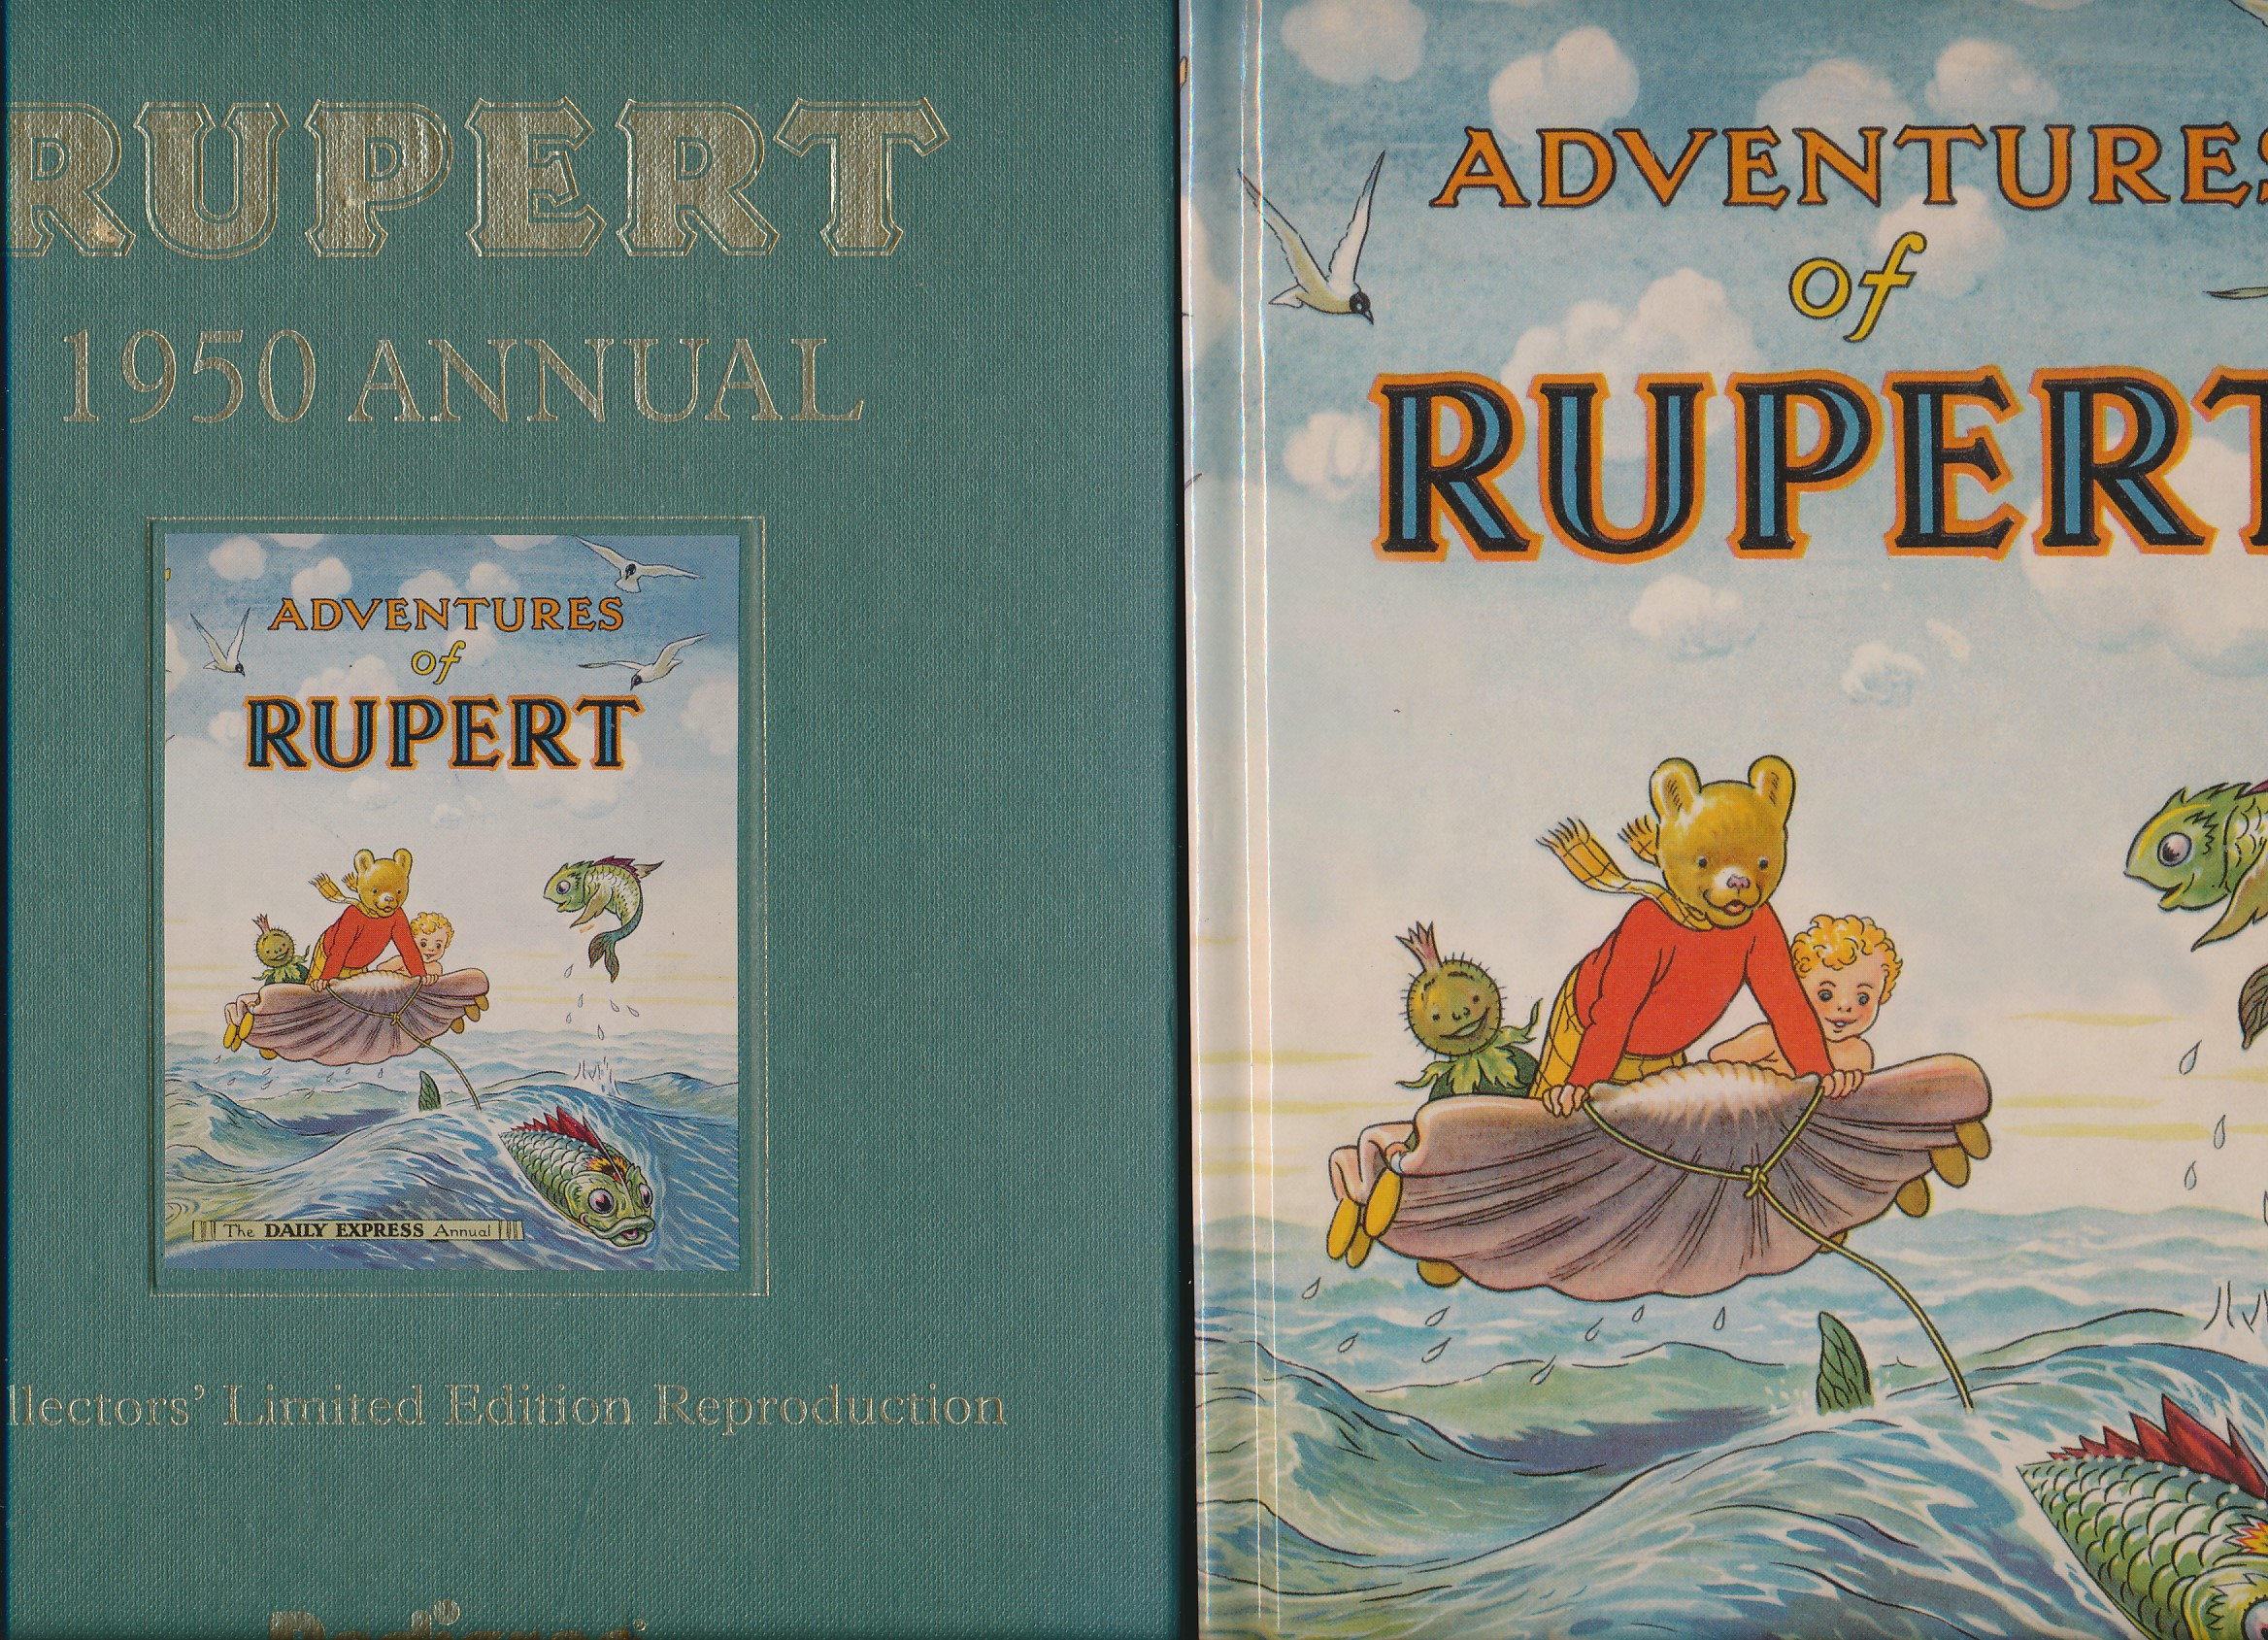 [TOURTEL, MARY] - More Rupert Adventures [Rupert Annual 1950] Facsimile Edition